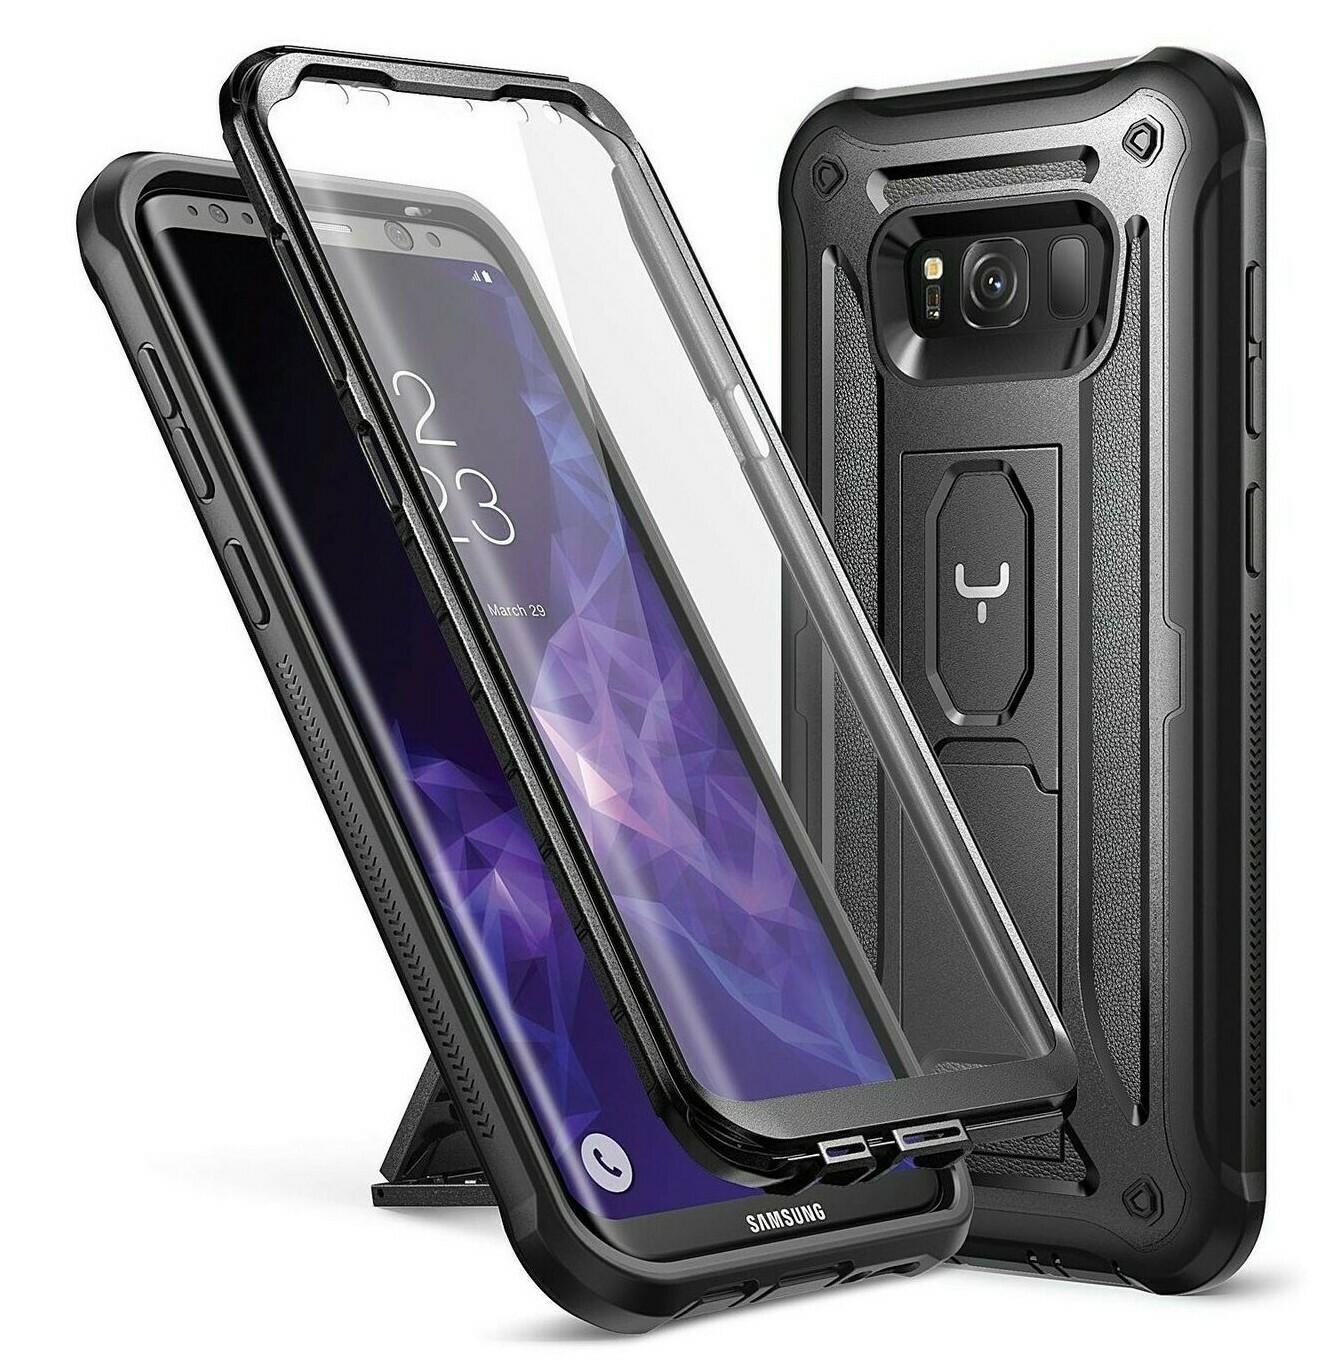 Case Galaxy S8 Plus c/ Parador c/ Mica Integrada Carcasa 360 Negro